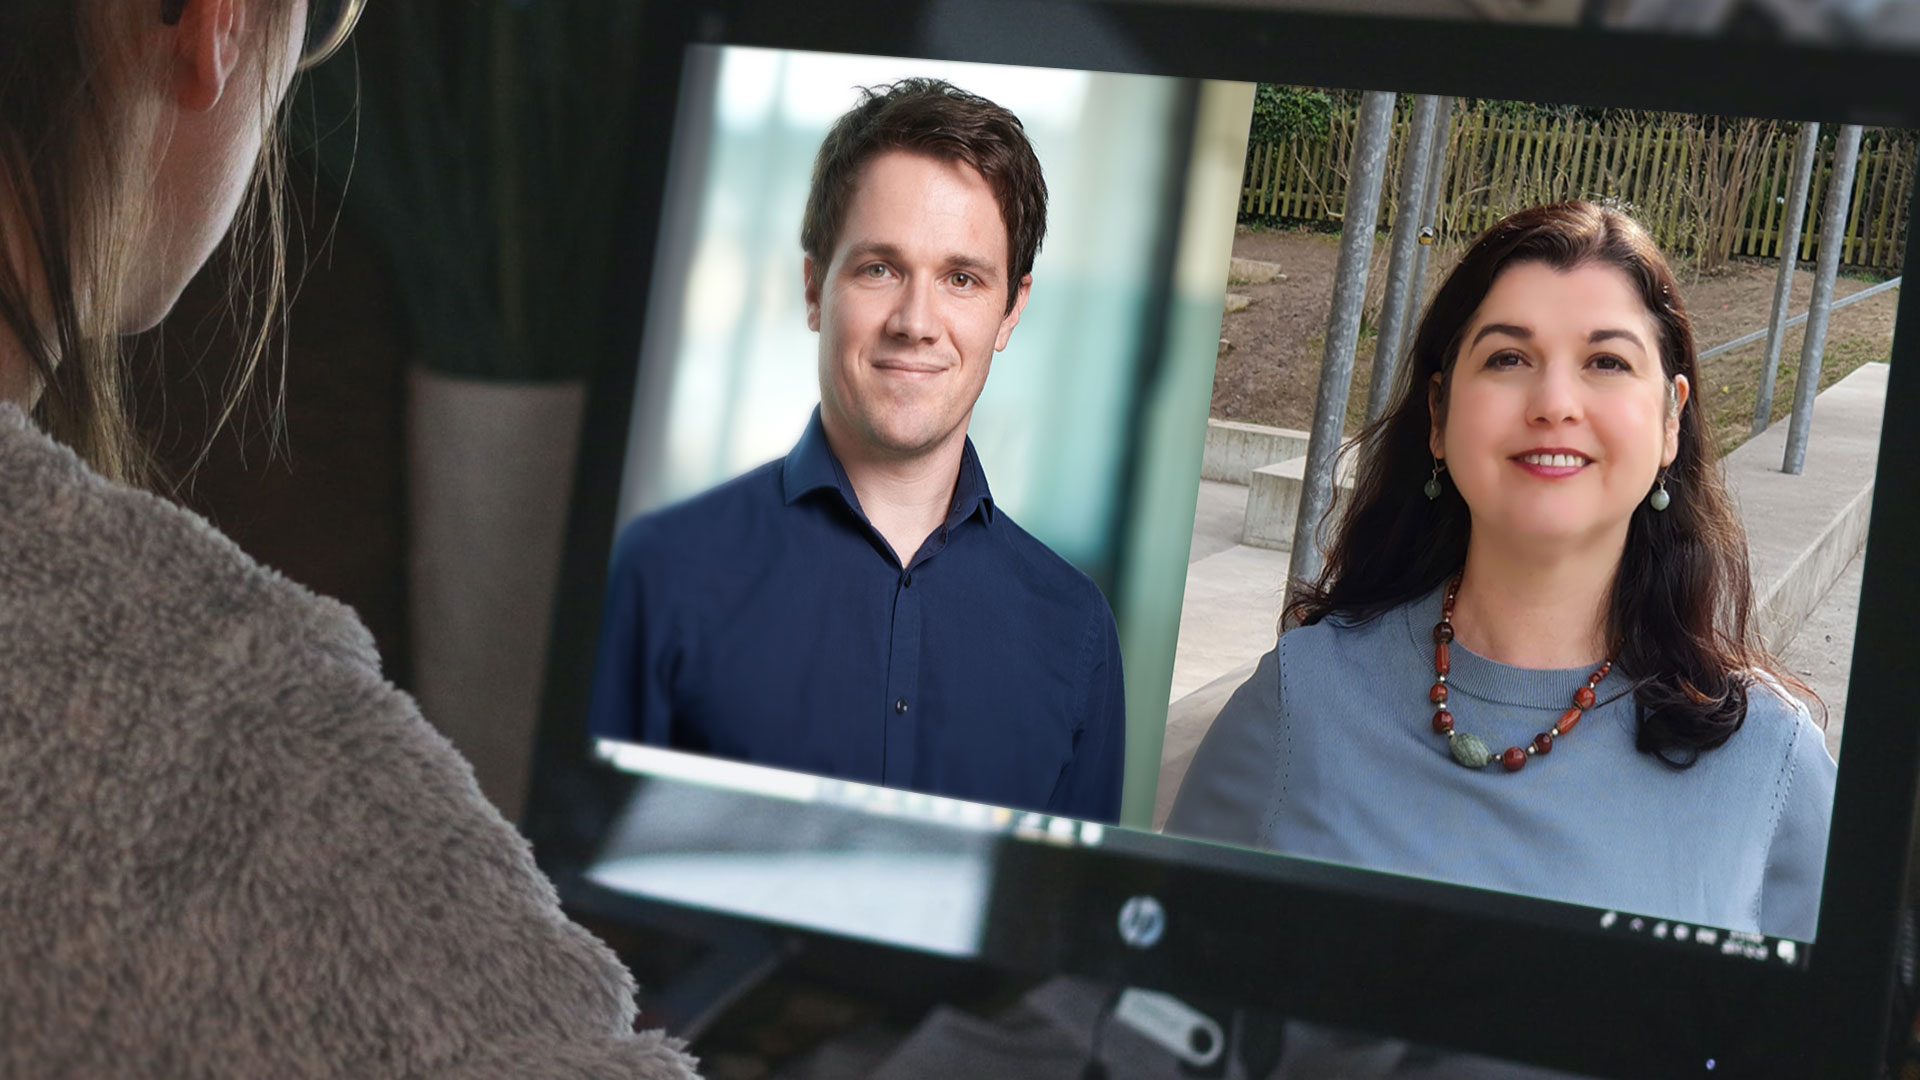 Studiengangleitung des Bachelorstudiengangs Sprachliche Integration Oliver Winkler und Marina Petkova